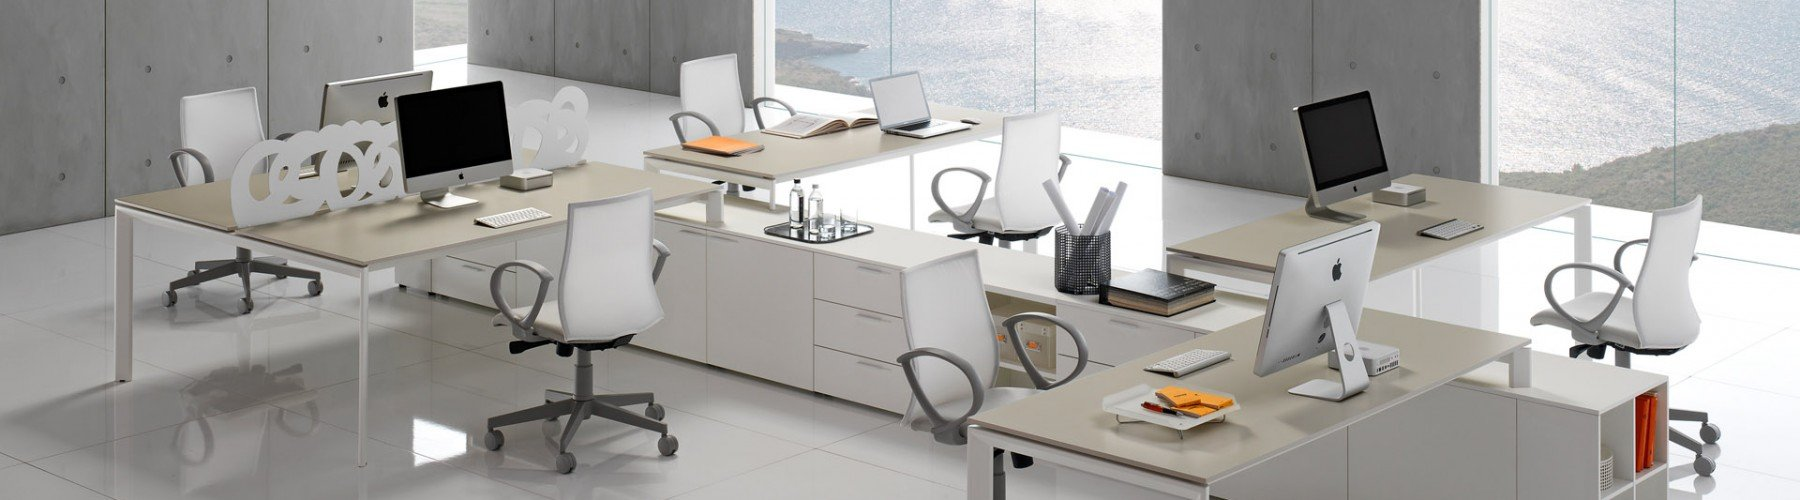 Mobiliario de oficina moderno | Muebles de oficina Spacio